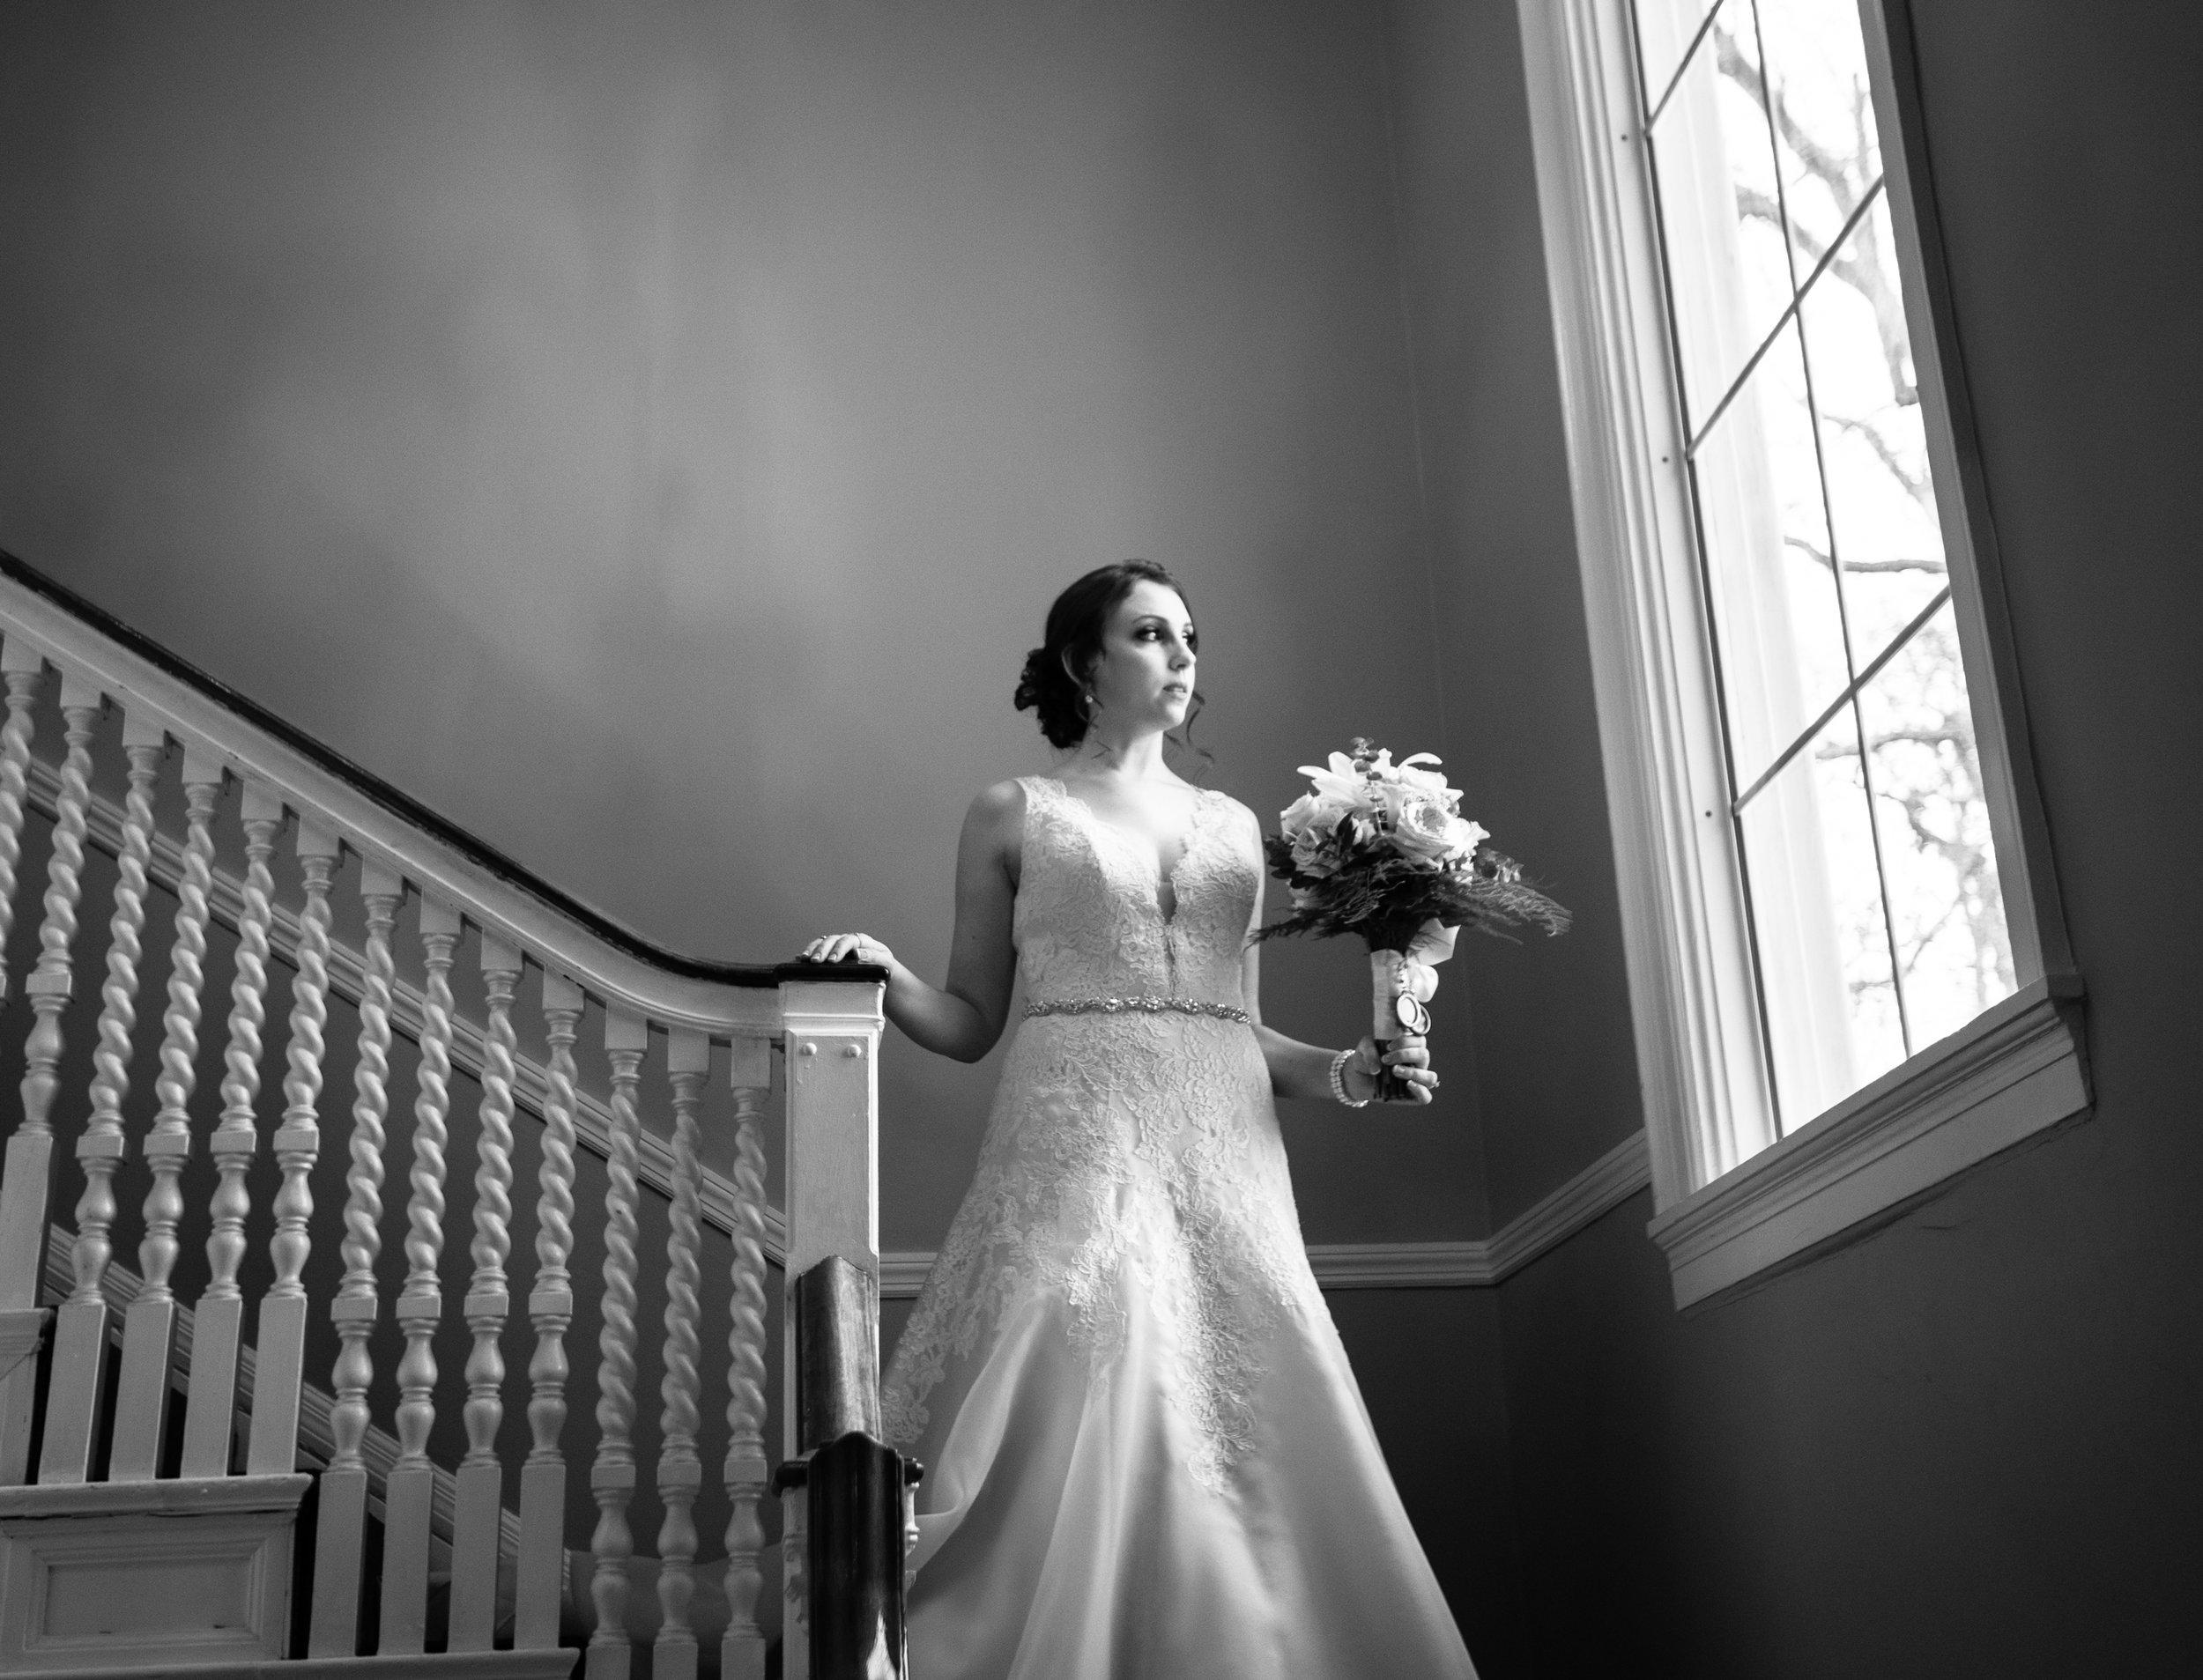 Harry Potter Wedding at Overhills Mansion Catonville Maryland Wedding Photographers Megapixels Media (30 of 134).jpg